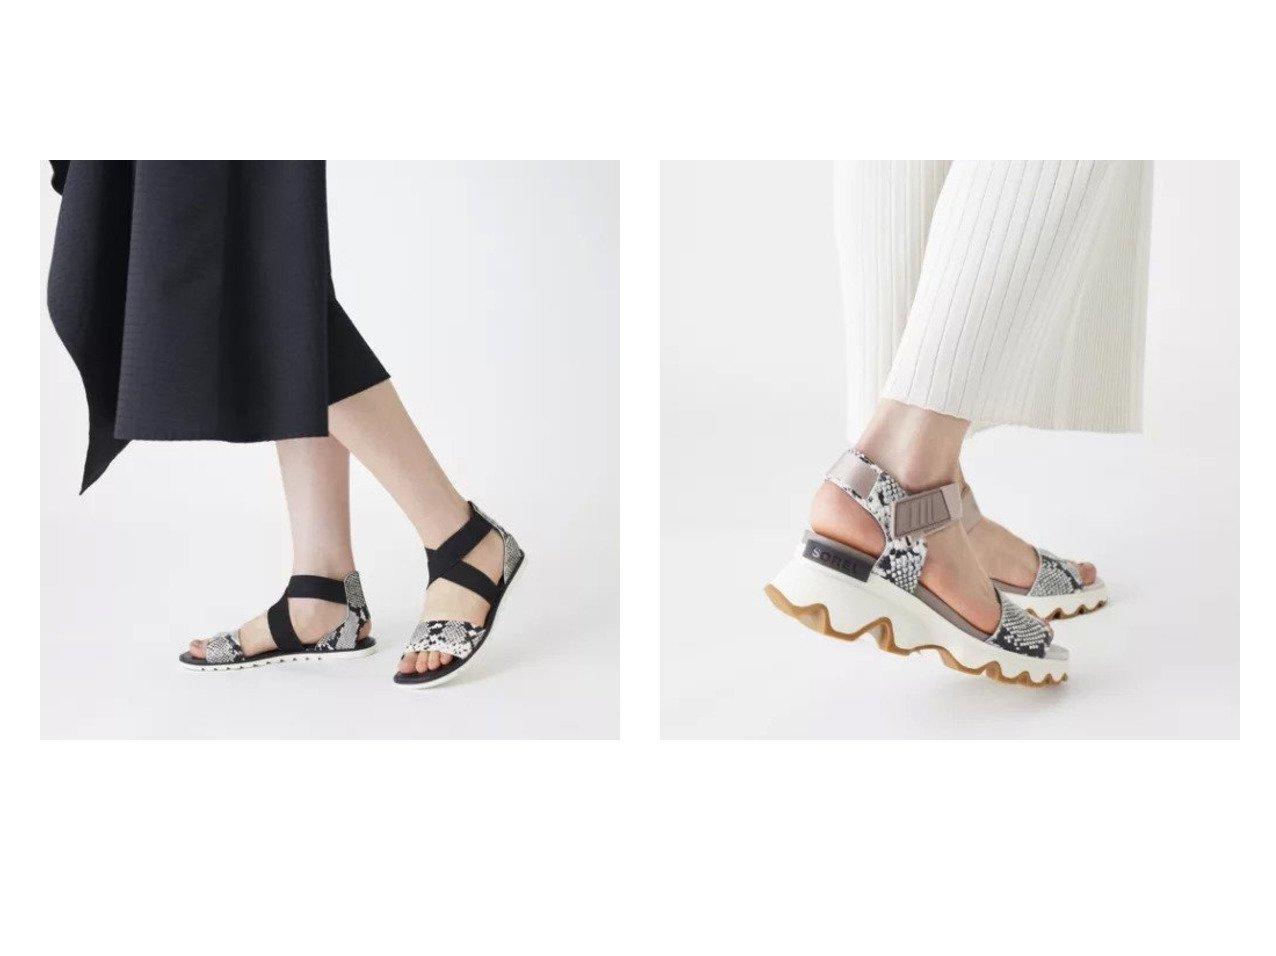 【Odette e Odile/オデット エ オディール】のSOREL Ella SD&SOREL Kinetic SD 【シューズ・靴】おすすめ!人気、トレンド・レディースファッションの通販 おすすめで人気の流行・トレンド、ファッションの通販商品 メンズファッション・キッズファッション・インテリア・家具・レディースファッション・服の通販 founy(ファニー) https://founy.com/ ファッション Fashion レディースファッション WOMEN サンダル シューズ フラット 人気 |ID:crp329100000031441